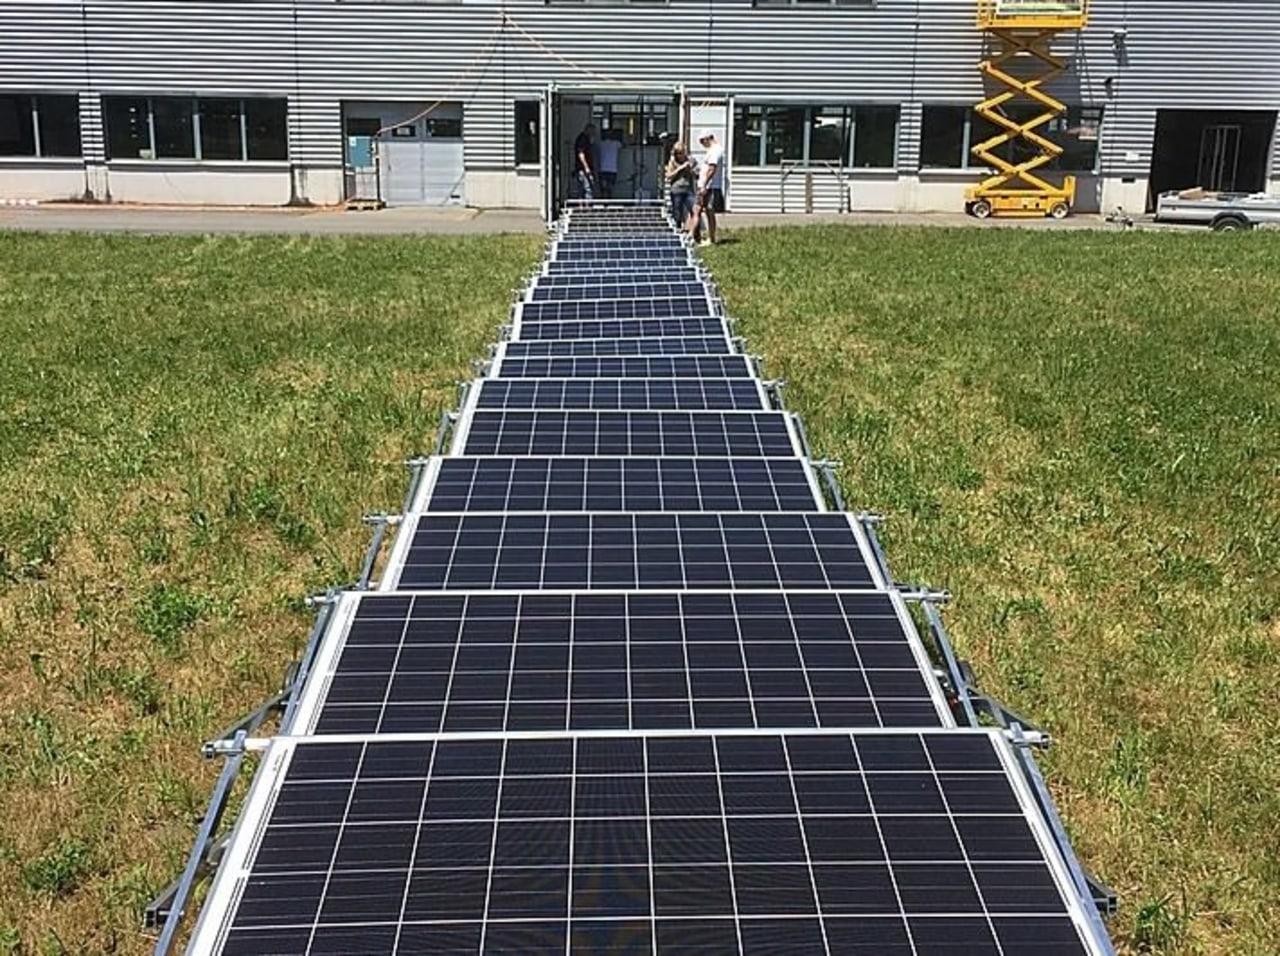 Transportable Solar Microgrid asphalt, grass, road surface, solar energy, solar panel, solar power, walkway, brown, black